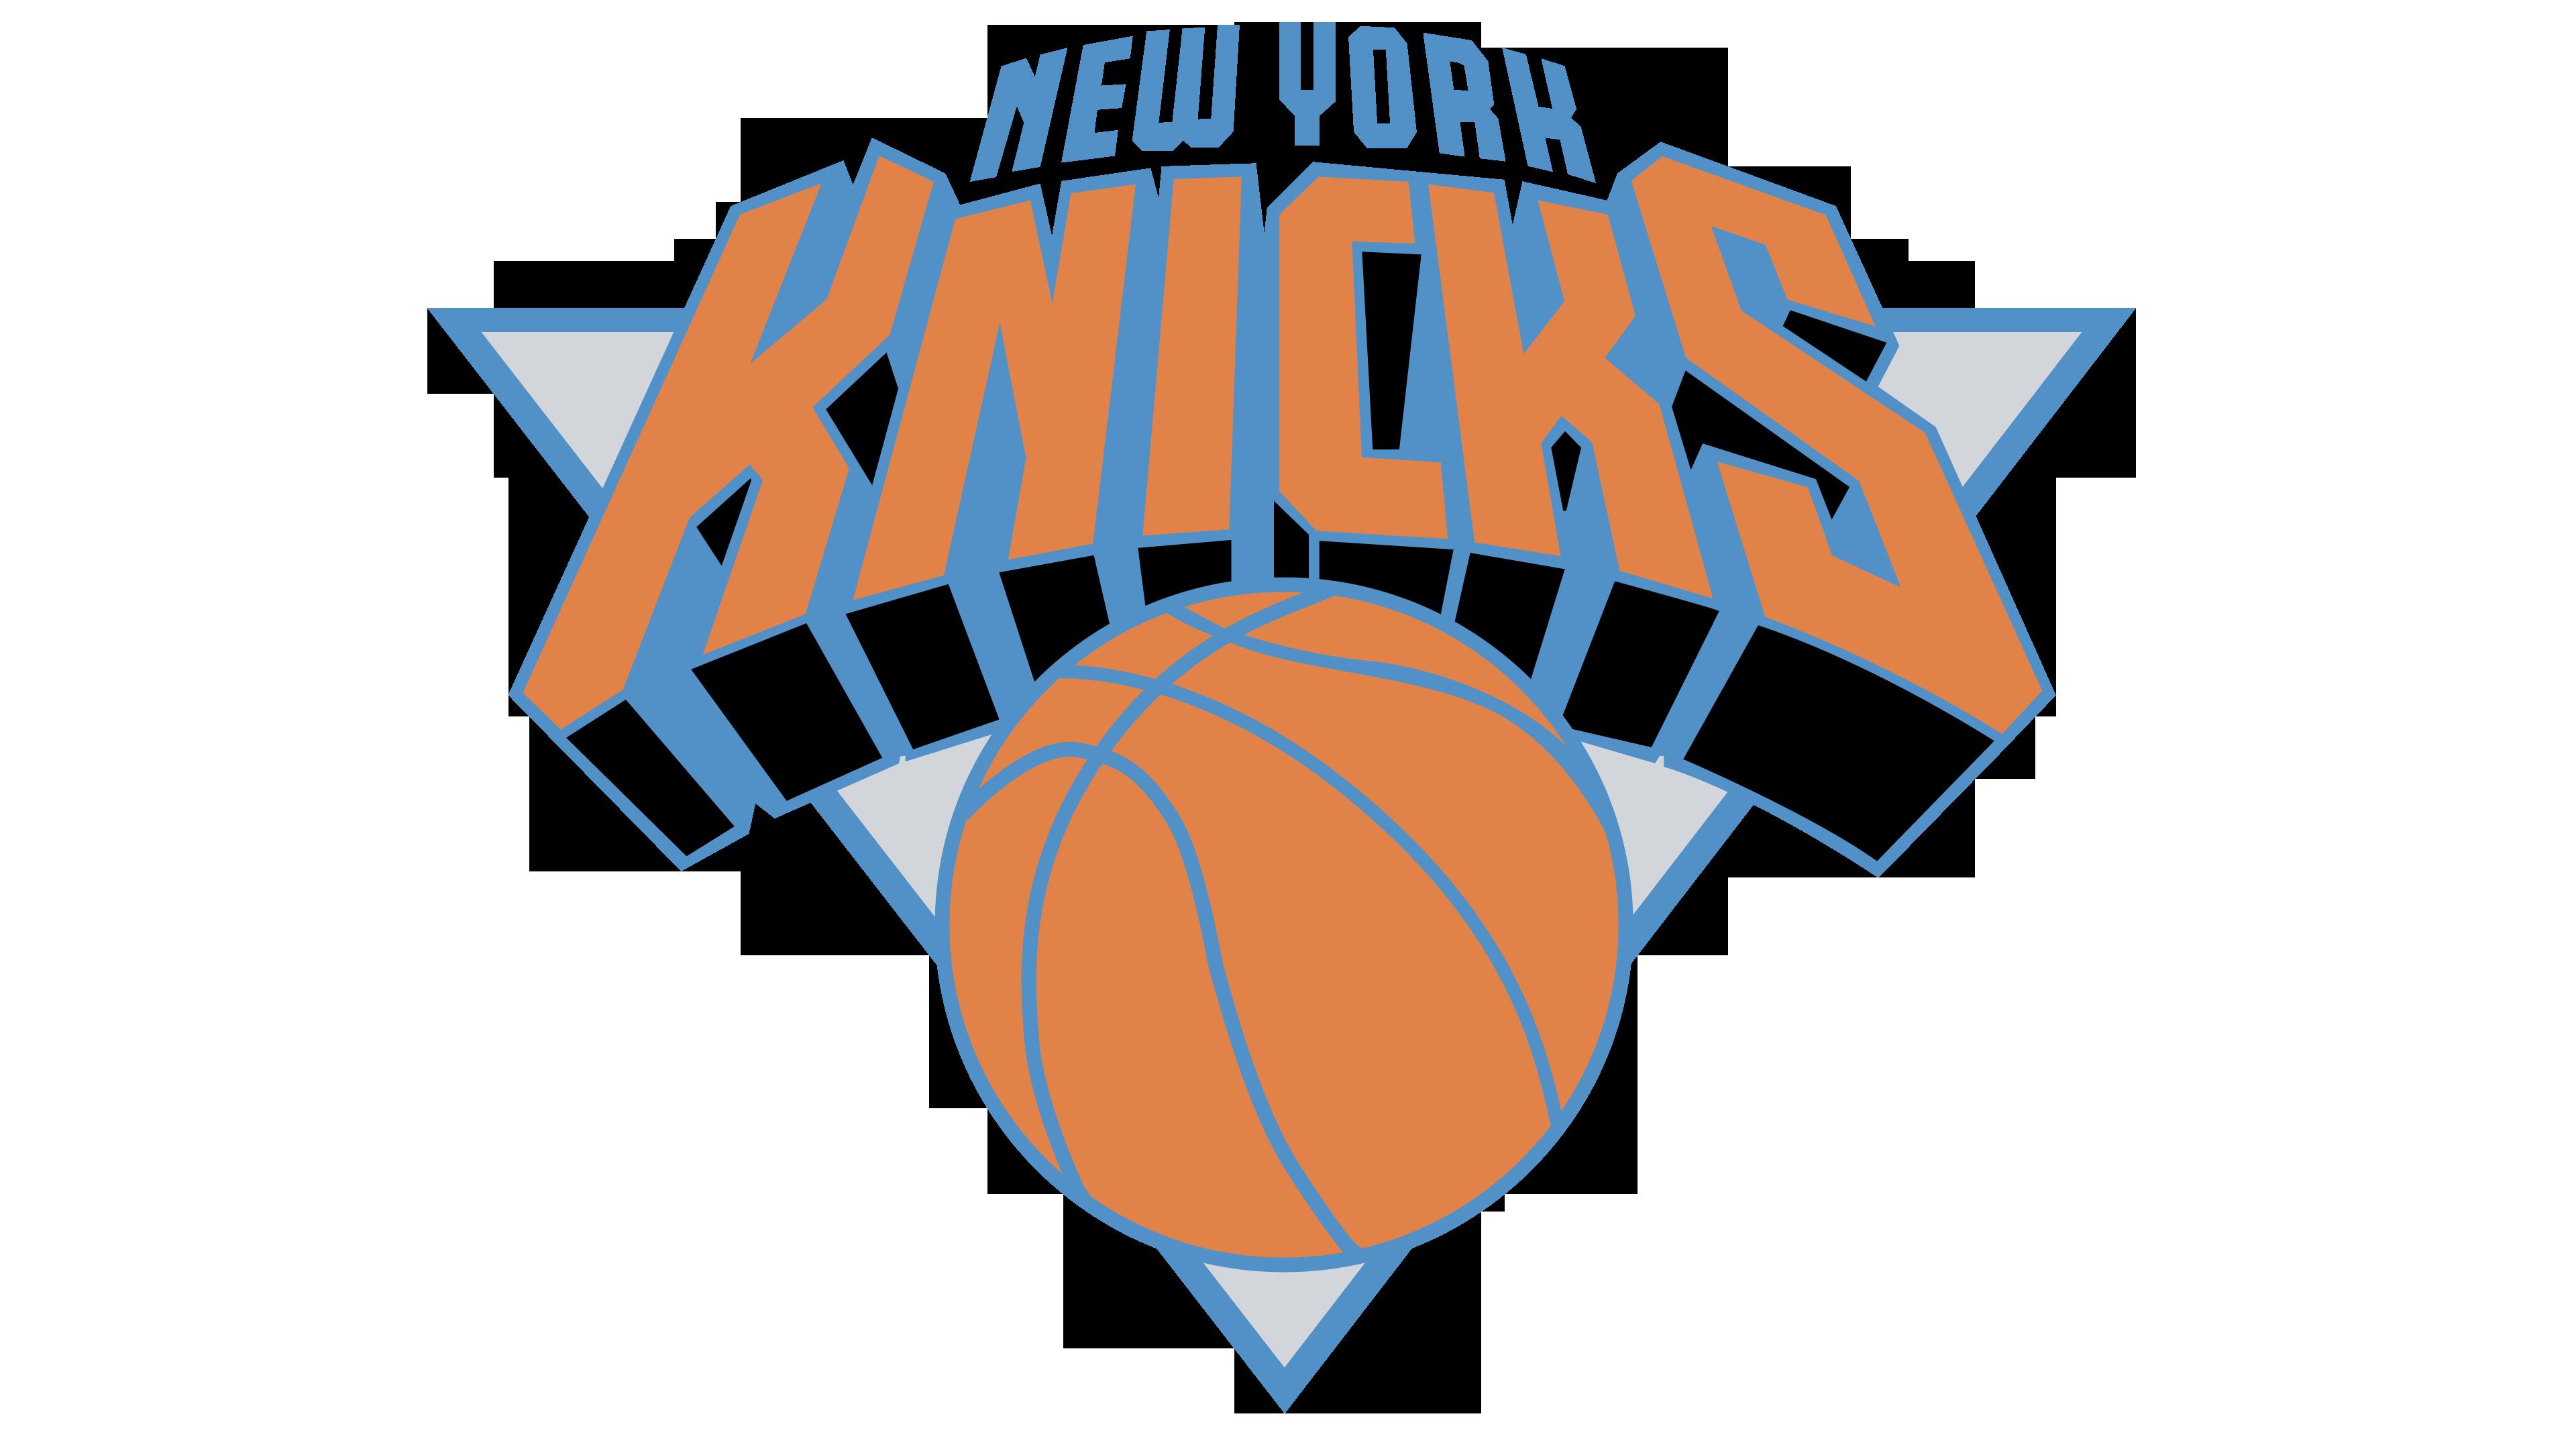 Modern basketball clipart jpg free stock New York Knicks logo - Interesting History of the Team Name and emblem jpg free stock